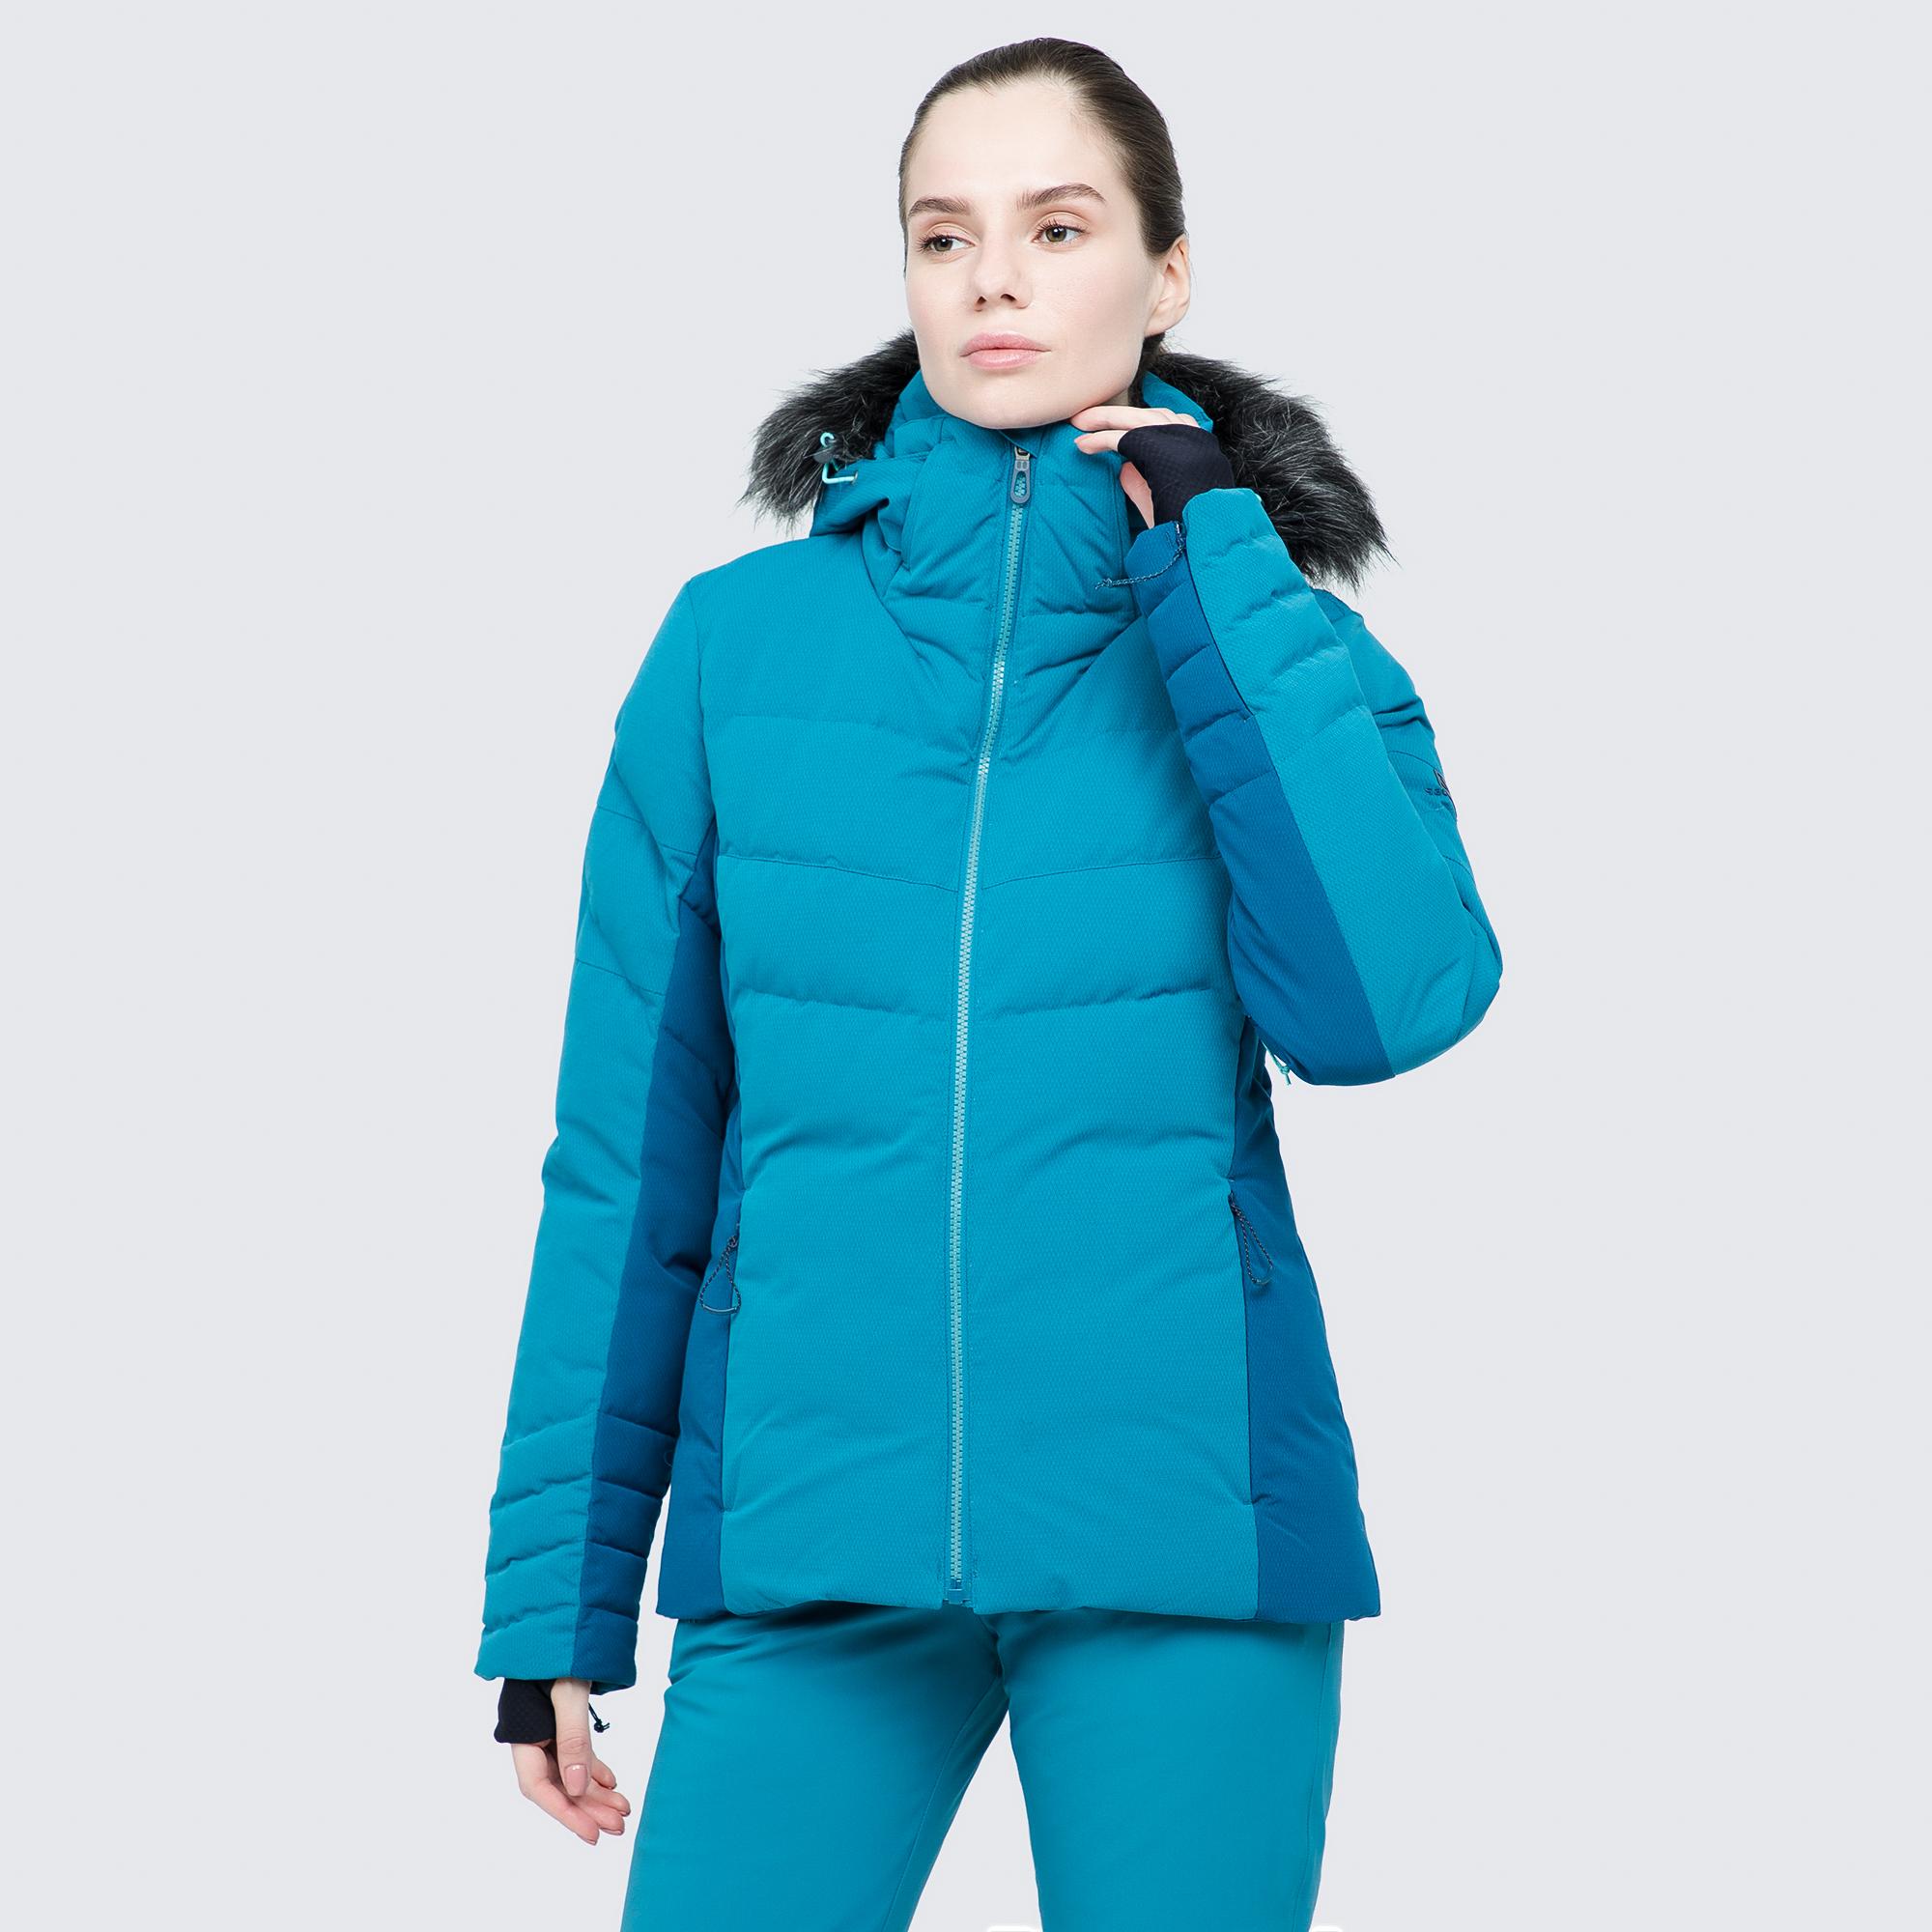 Фото - Salomon Куртка пуховая женская Salomon IceTown, размер 48-50 куртка женская trussardi цвет темно синий 36s00158 blue night размер l 46 48